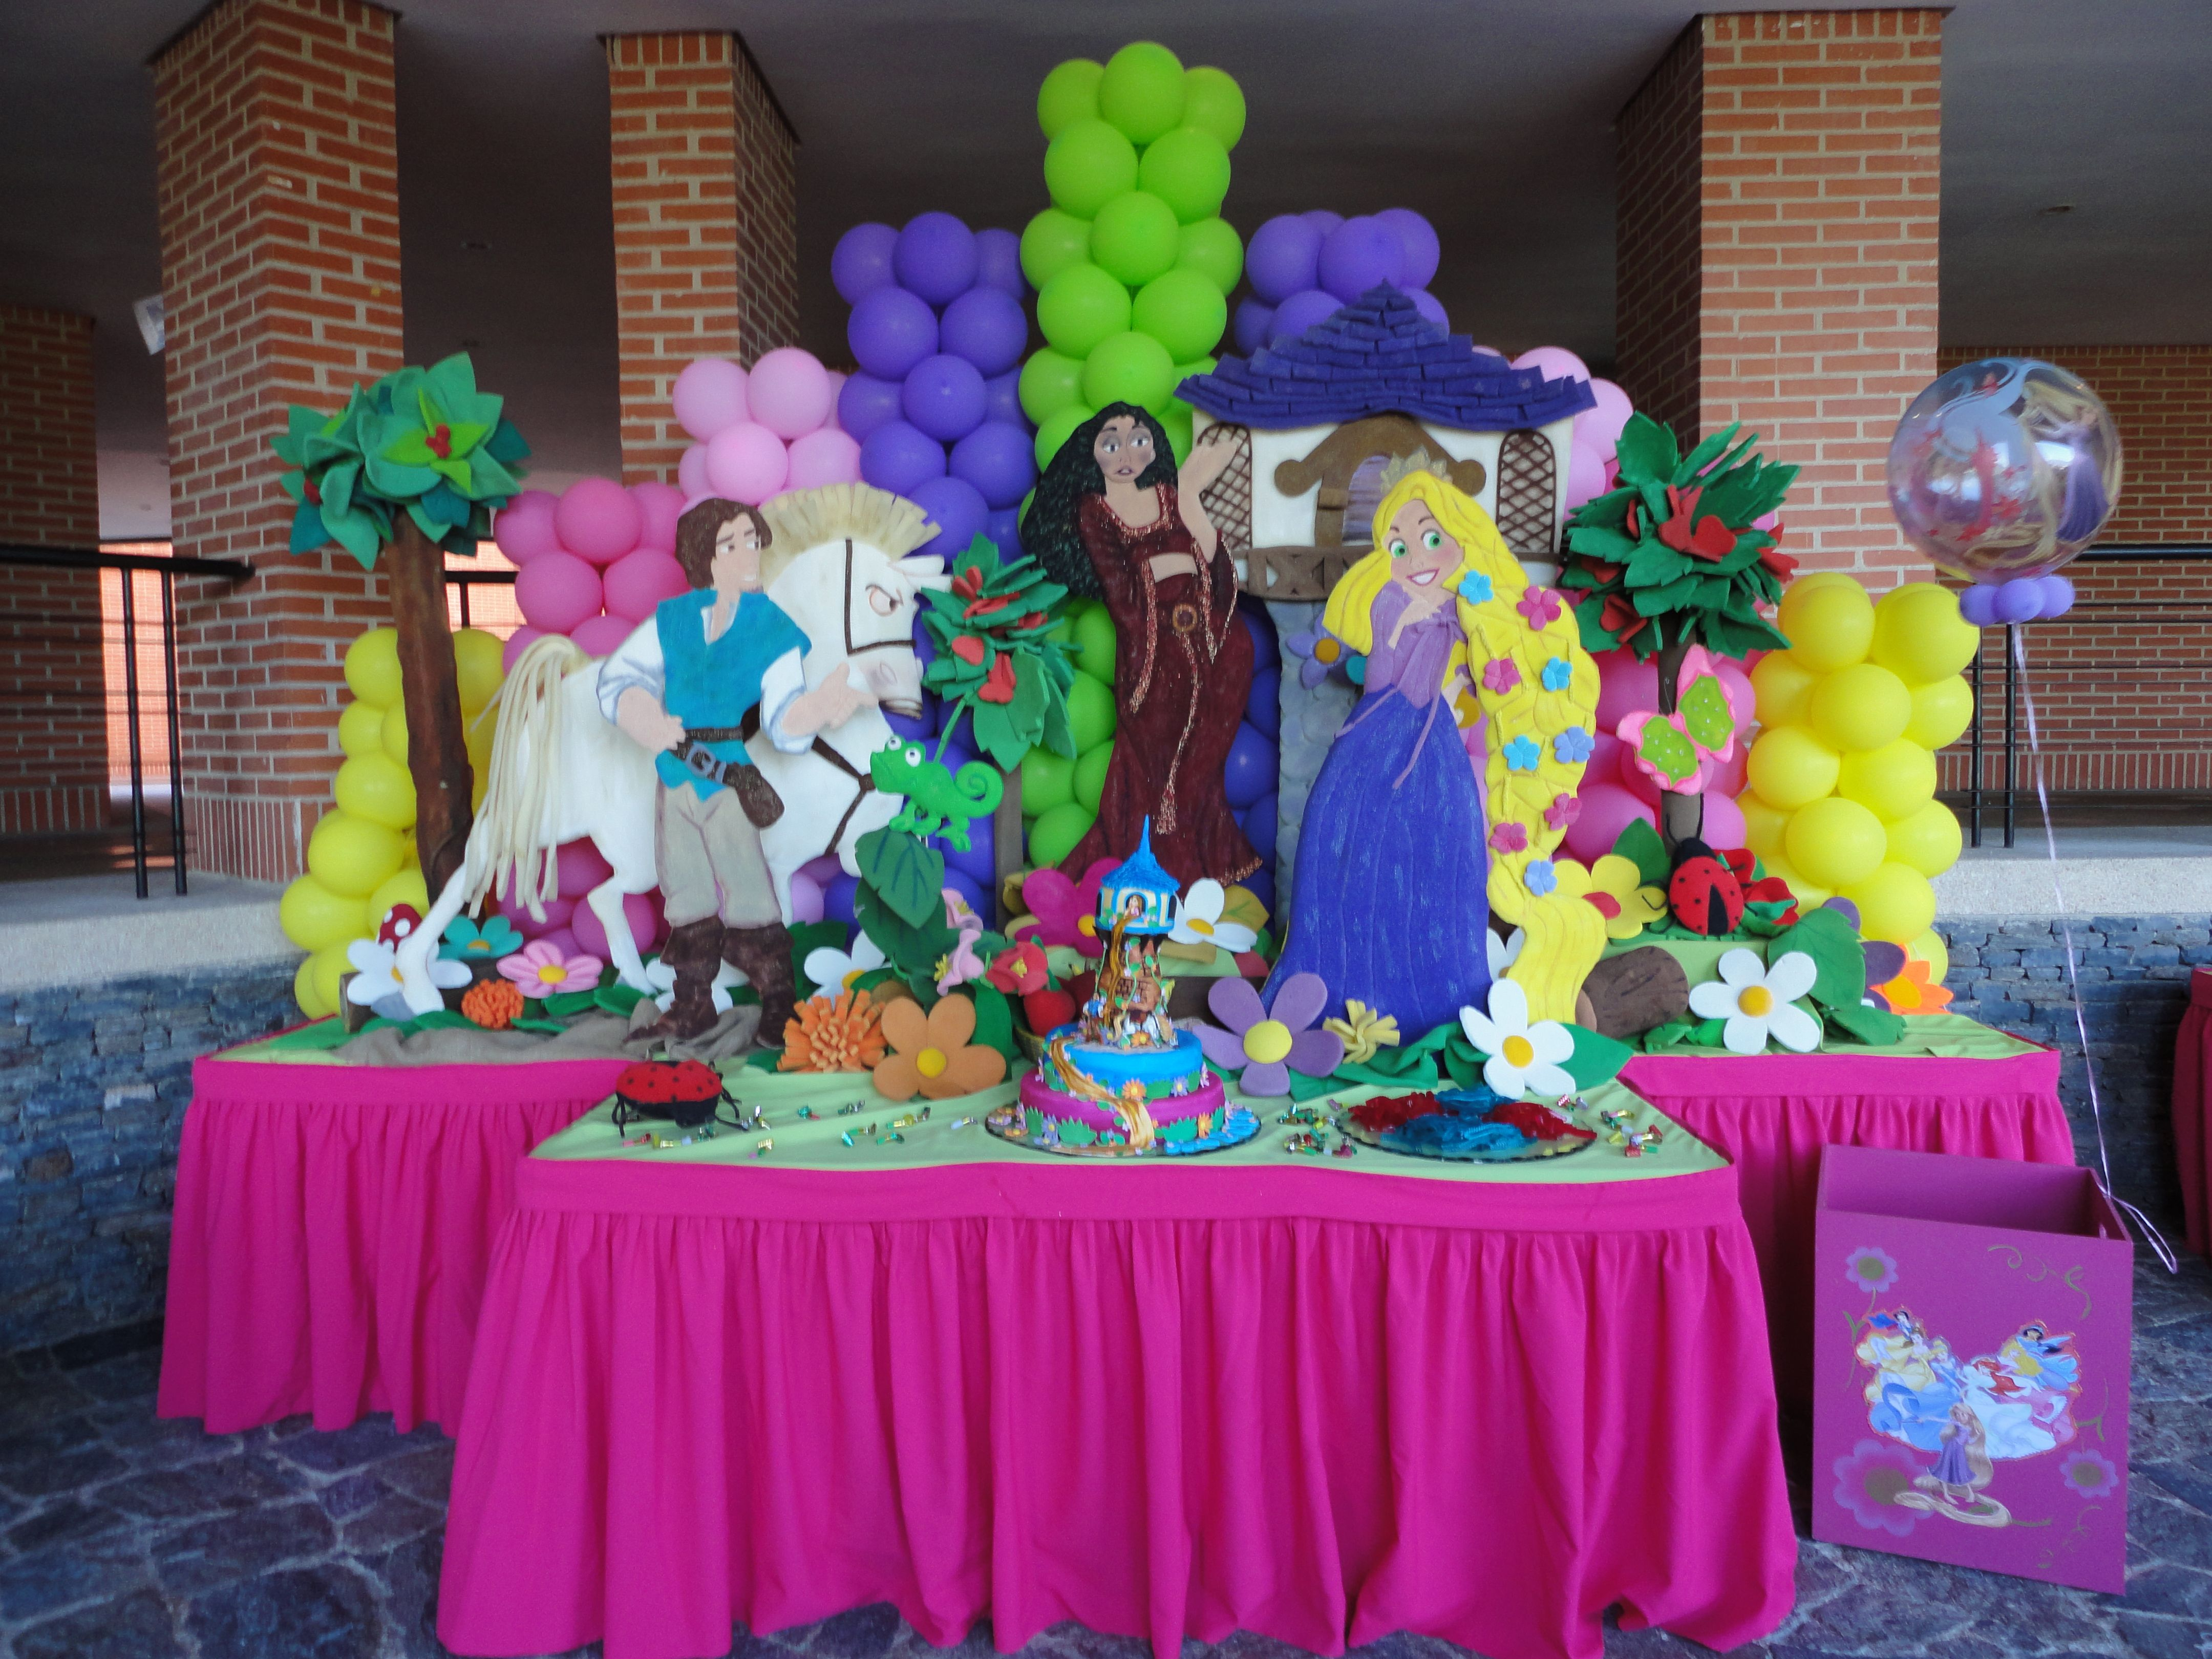 decoracion de fiestas infantiles decoracion de toys story